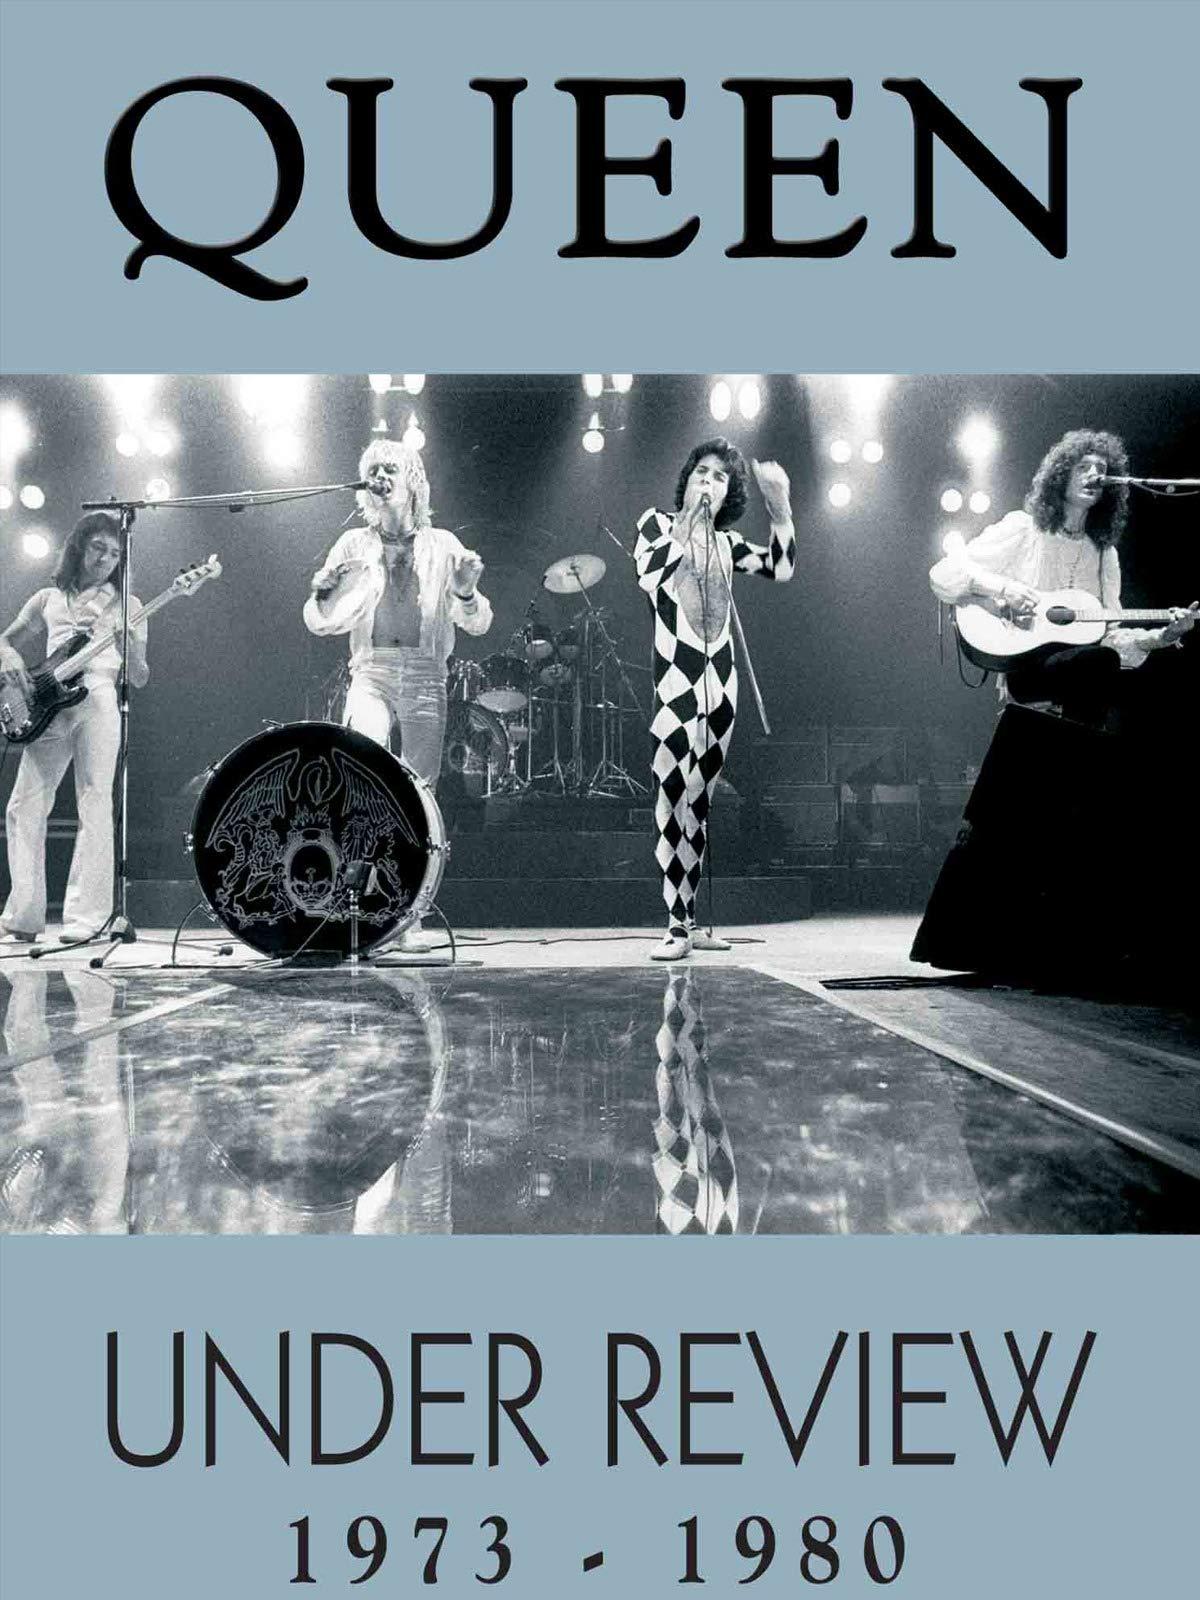 Queen - Under Review 1973-1980 on Amazon Prime Instant Video UK